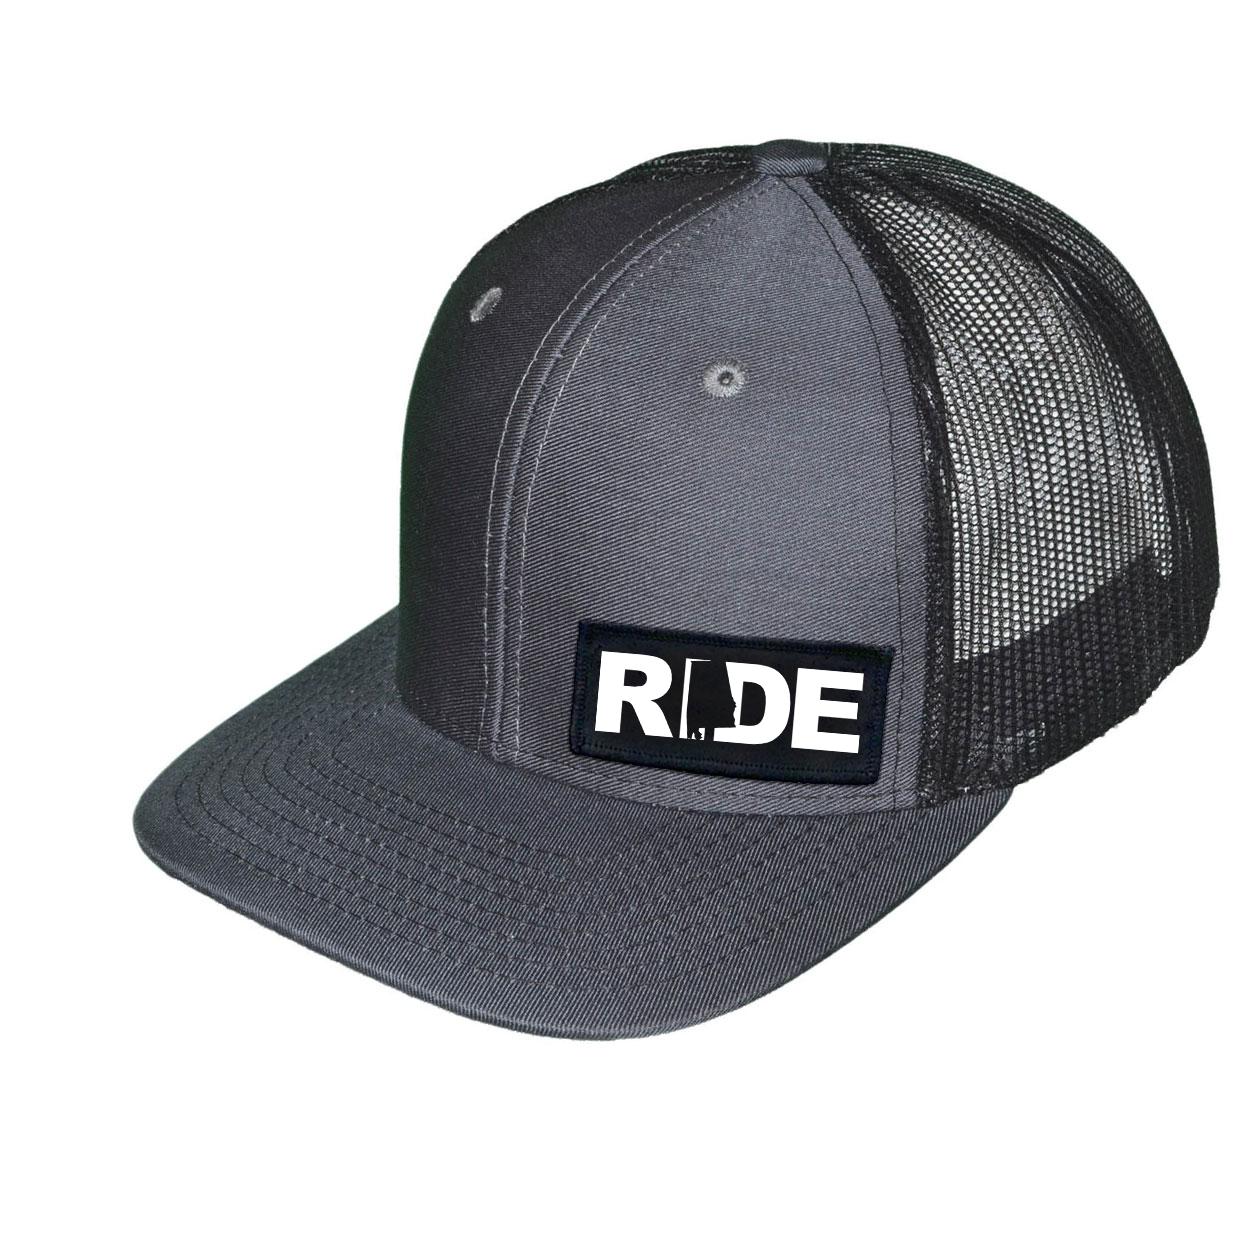 Ride Alabama Night Out Woven Patch Snapback Trucker Hat Dark Gray/Black (White Logo)